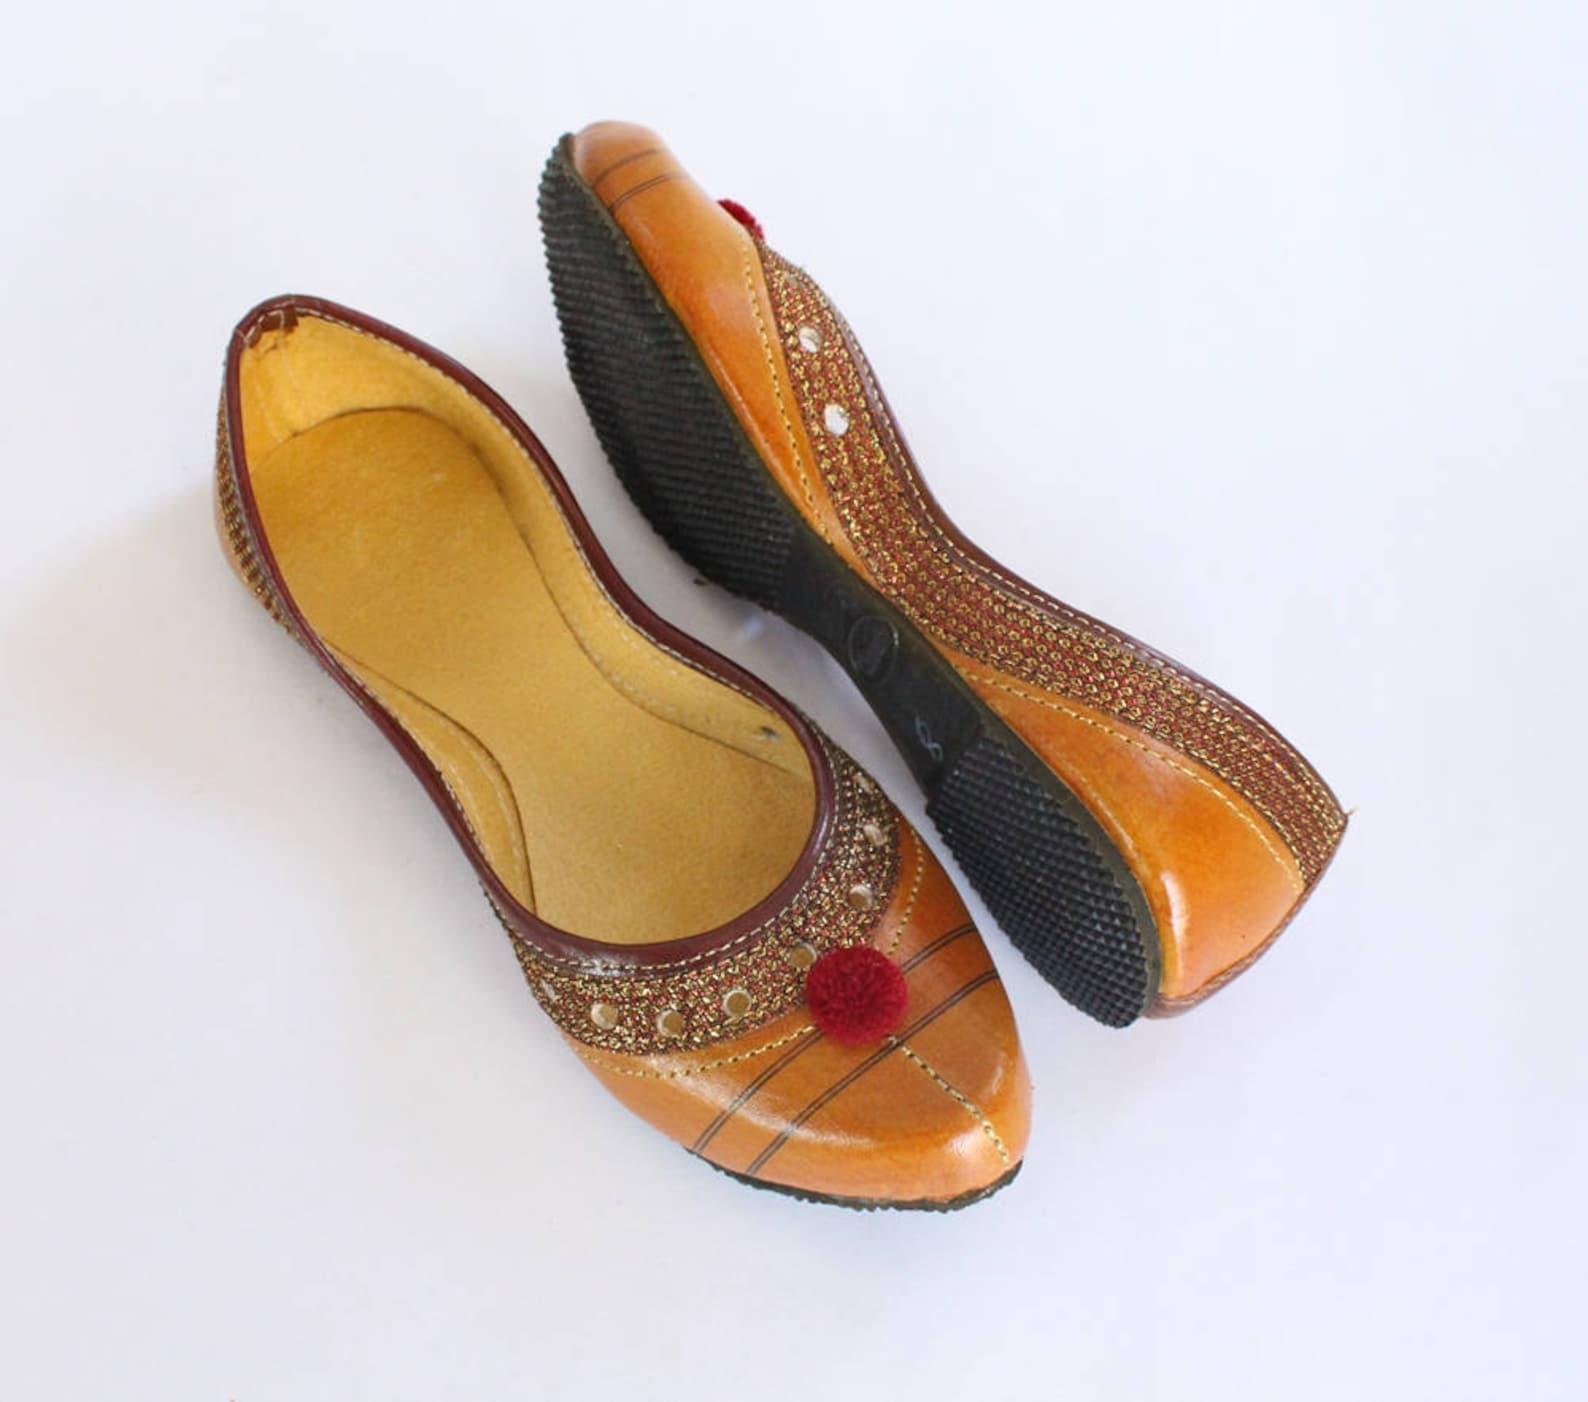 indian flat shoes/women shoes/punjabi jutti/orange shoes/ballet flats/muslim shoes/handmade khussa wedding women shoes us size 4